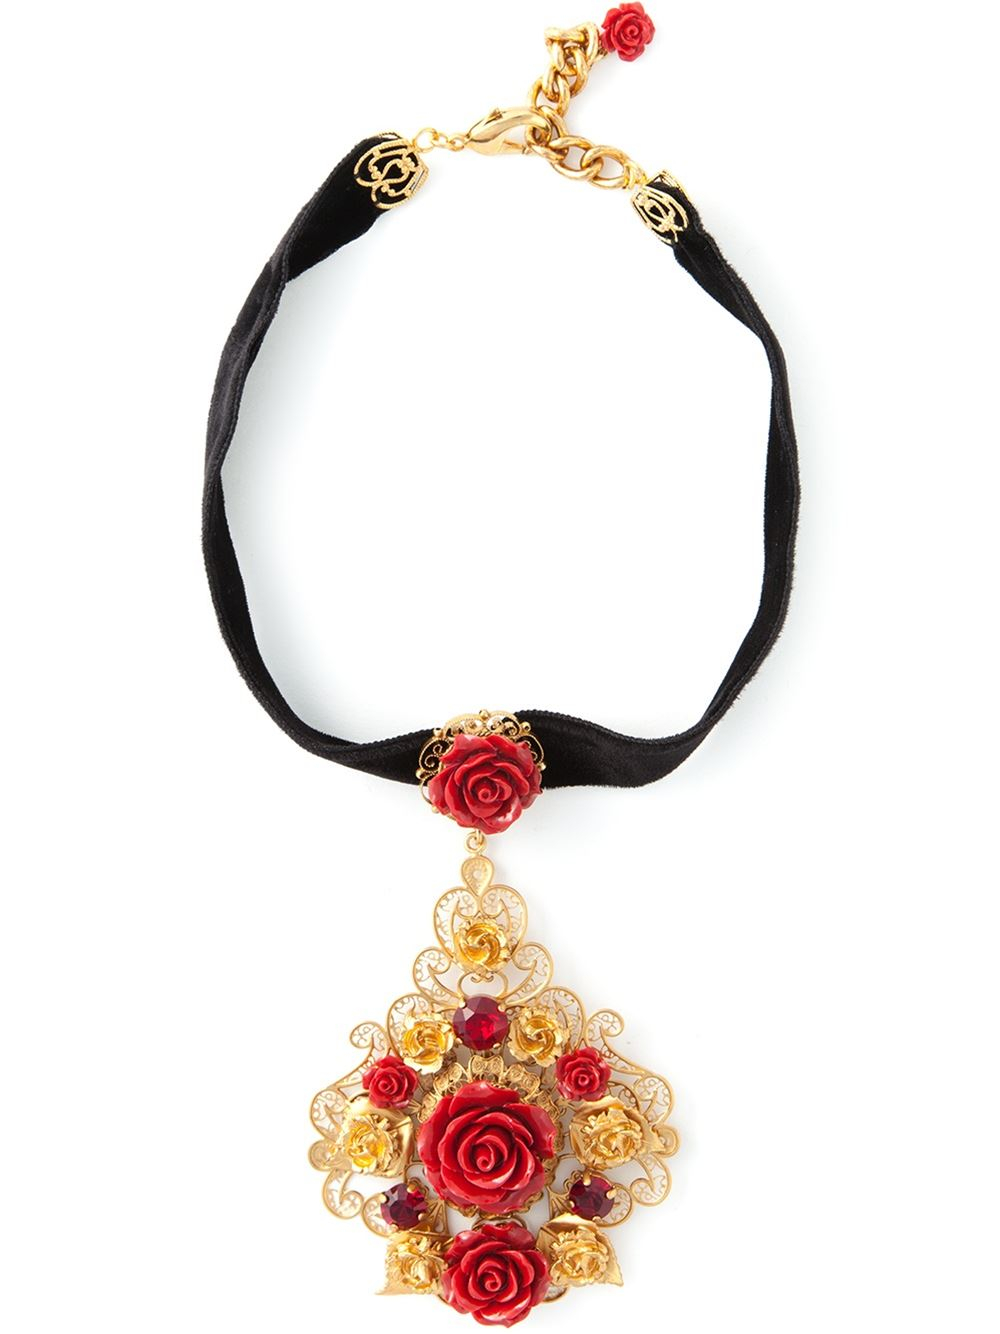 Dolce & Gabbana crystal rose necklace - Metallic Nnu6iLjHj